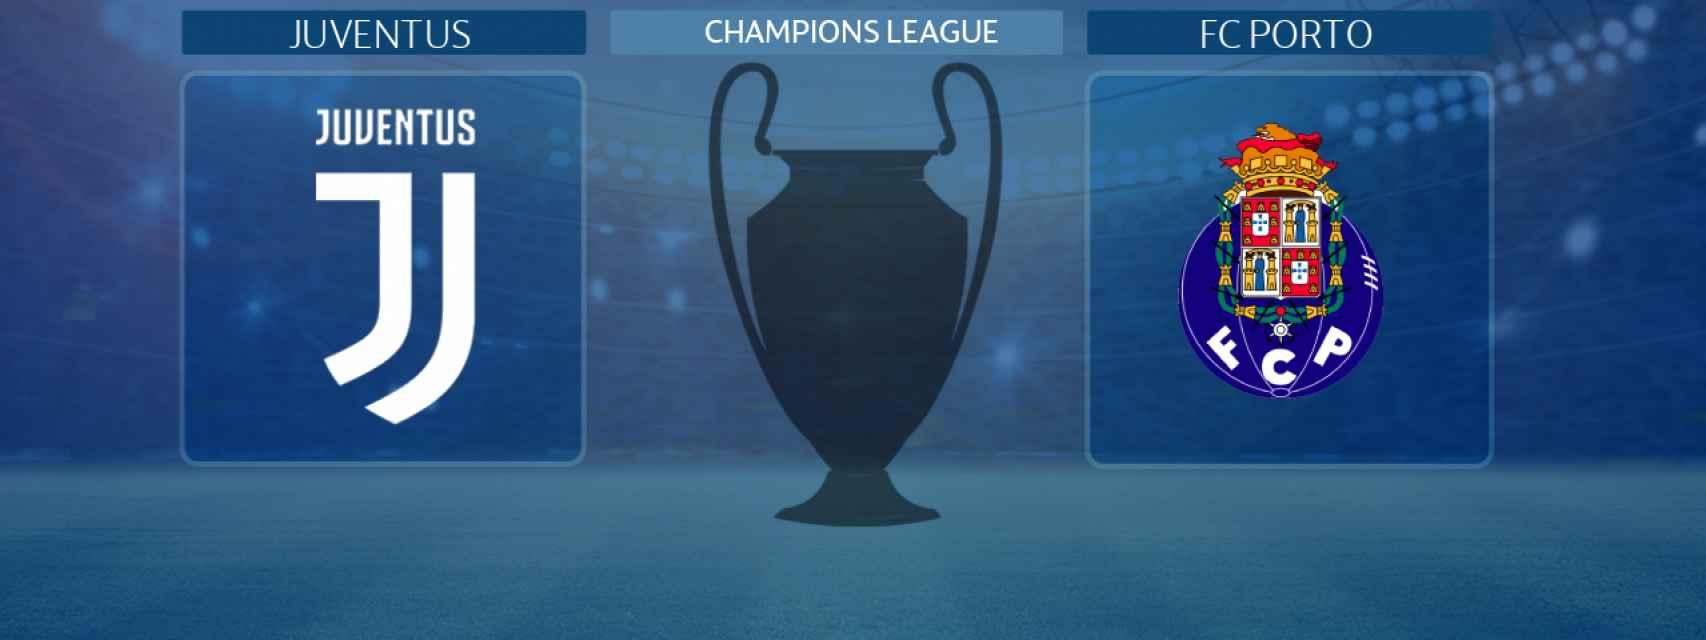 Juventus - Oporto, partido de la Champions League